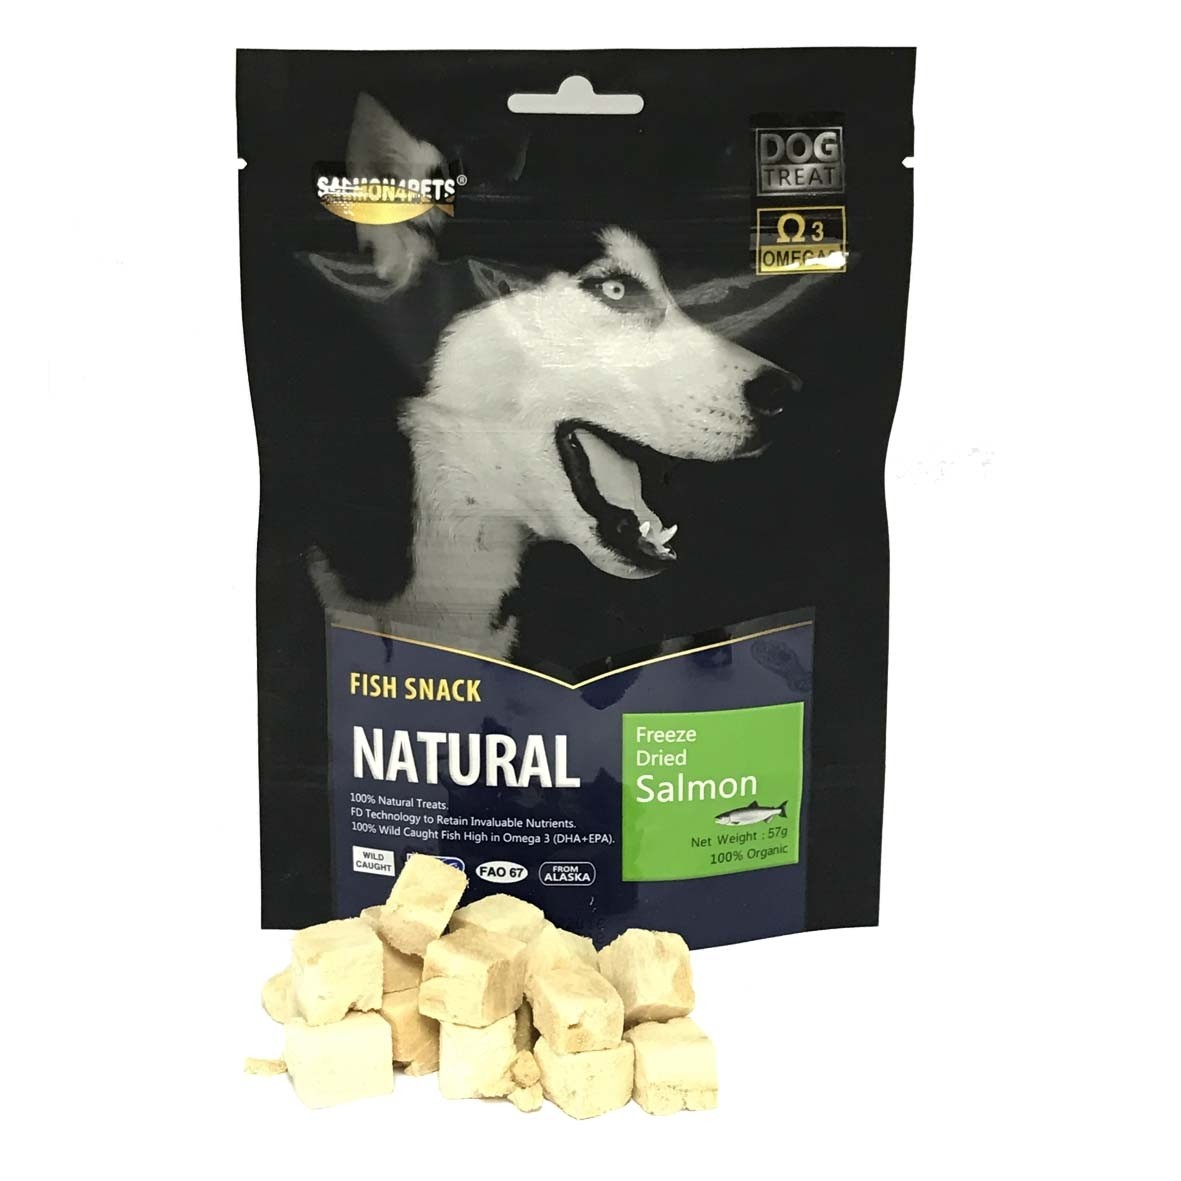 Salmon4Pets Dog Treats Freeze Dried Salmon - 57g (F51503)